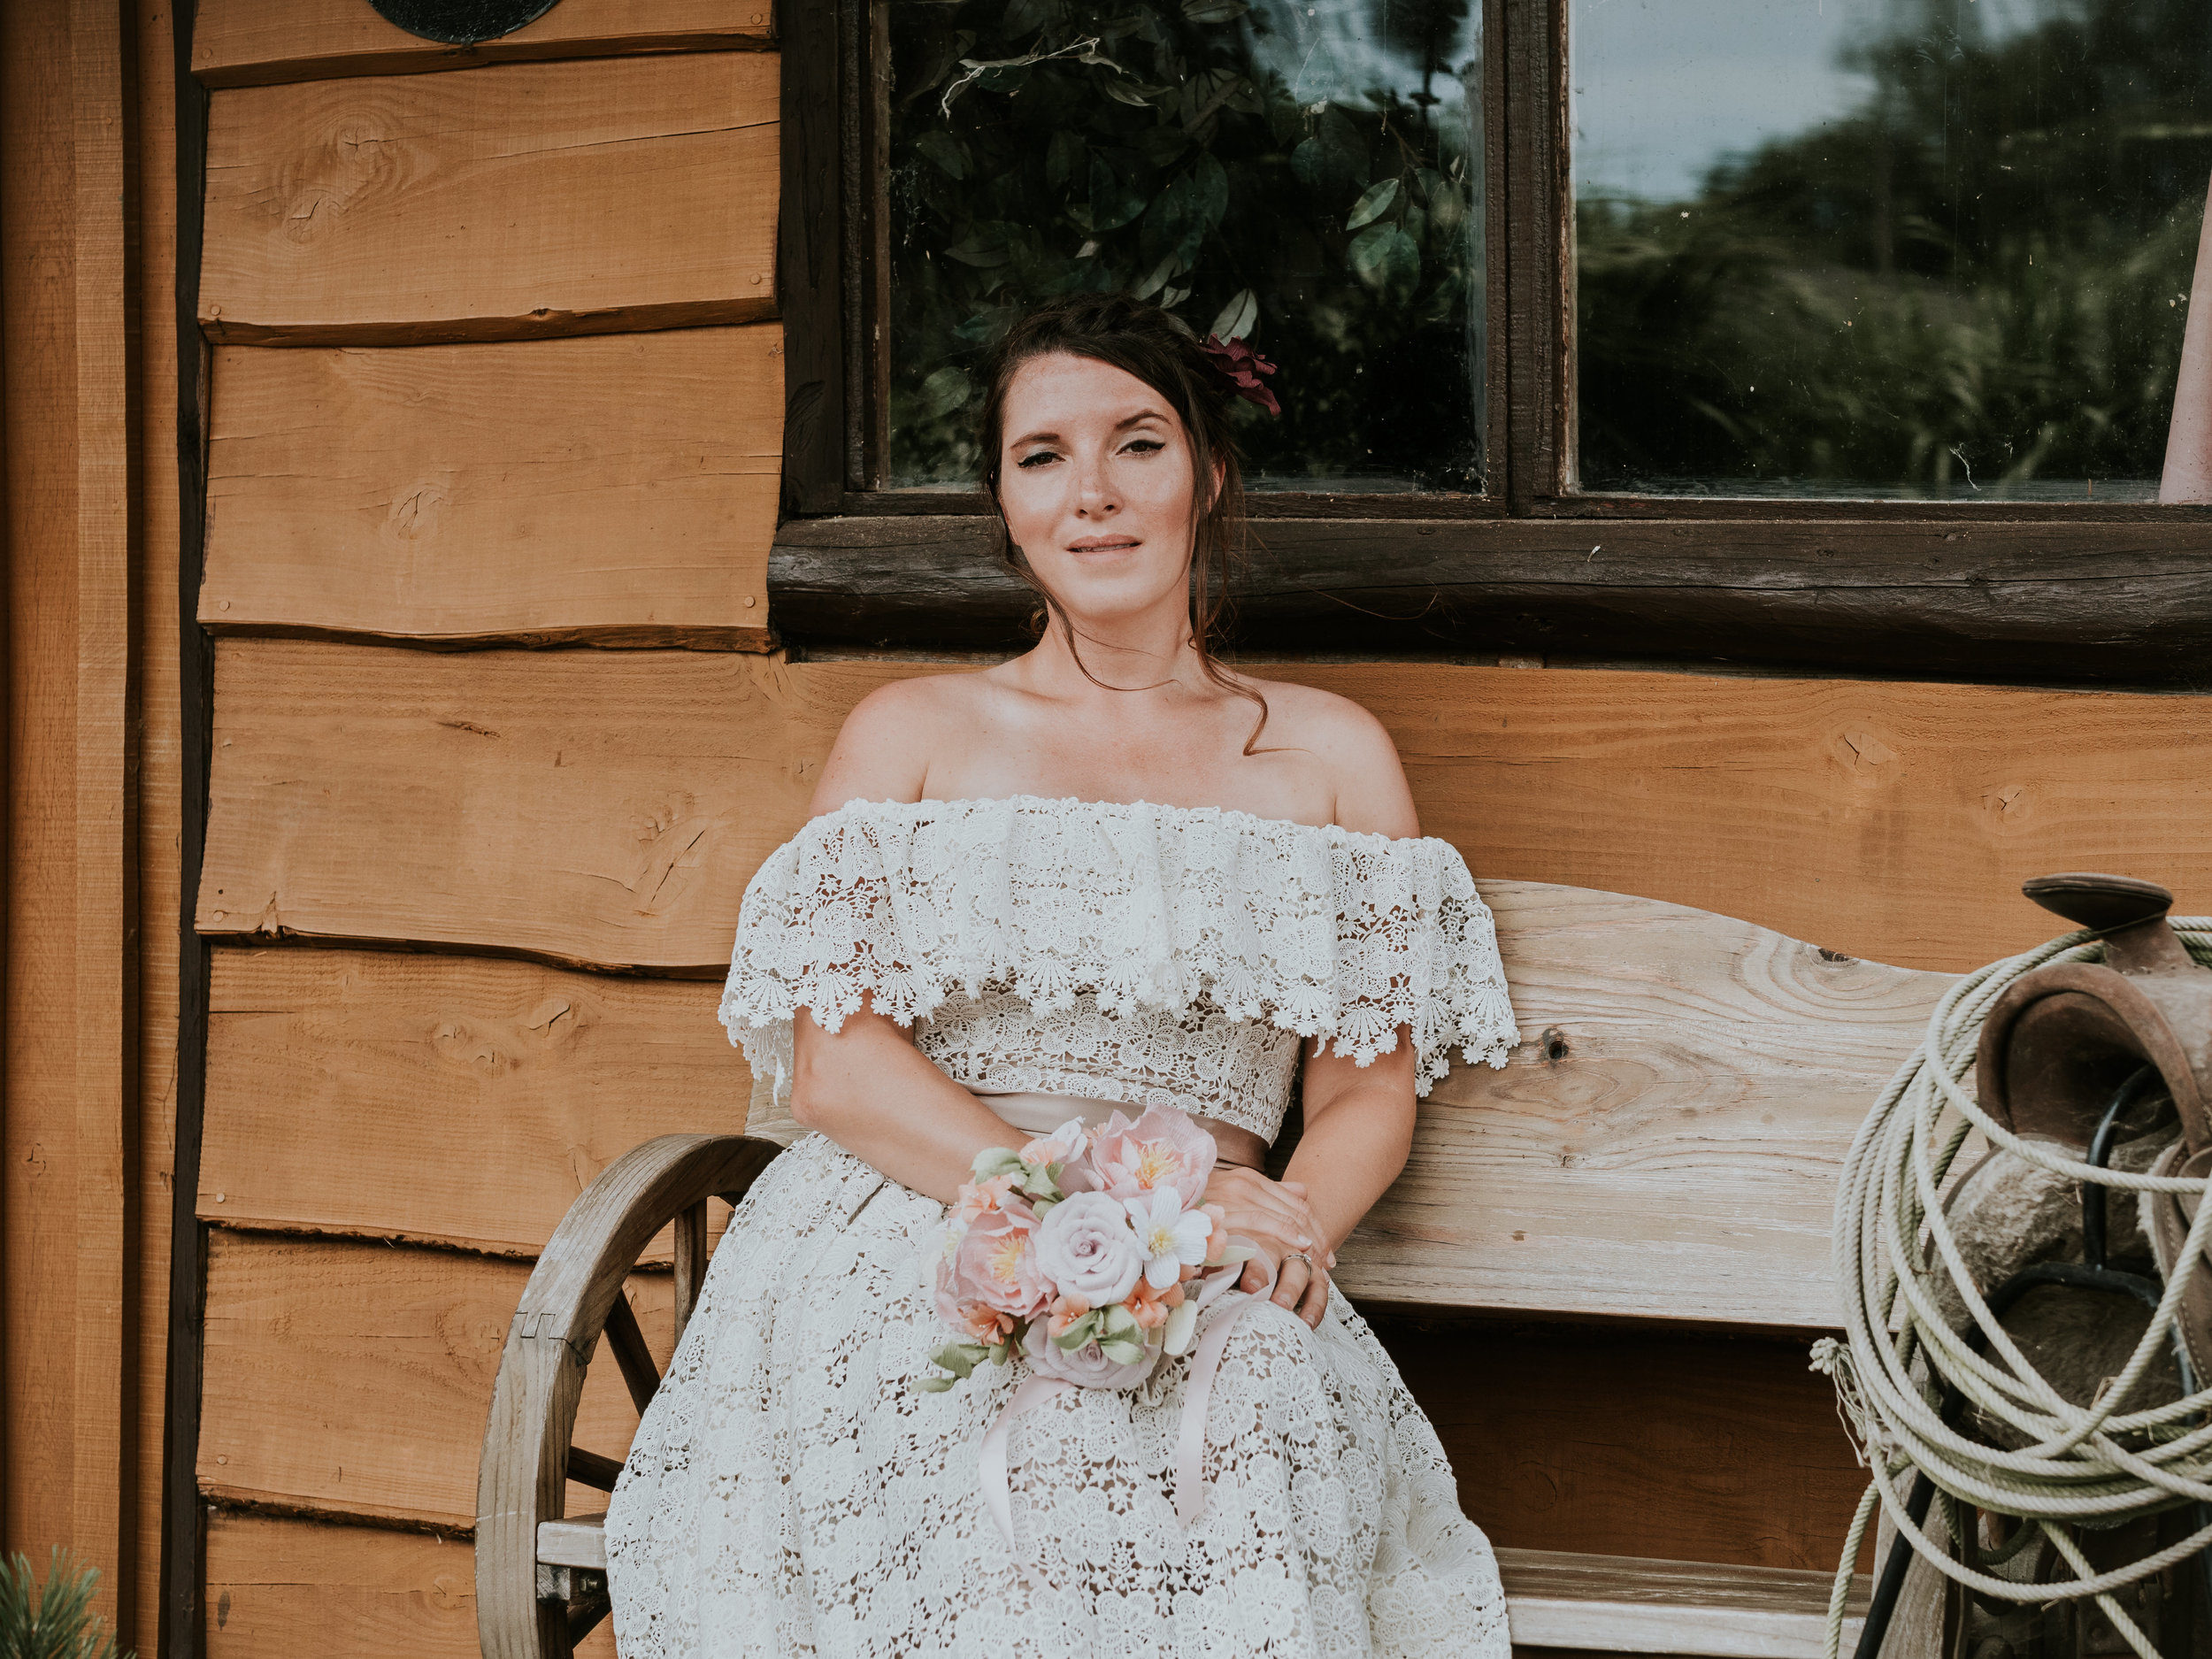 Jessica-Milberg-Photography-Brighton-London-Wedding-Fashion-Photographer-Creative-Wedding-Dress-68.jpg